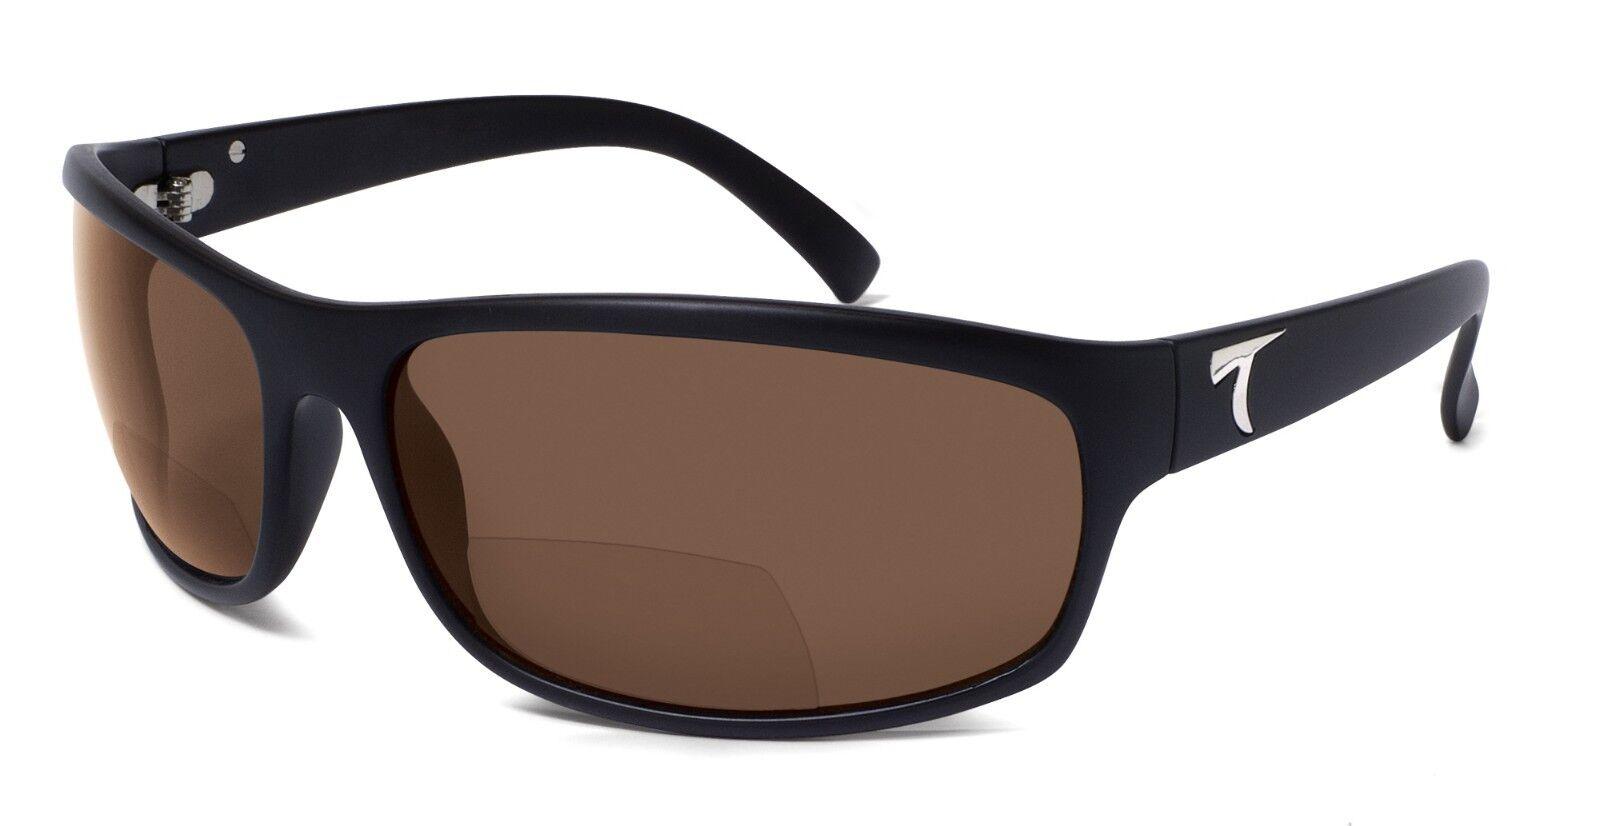 adc0896a5e6 HARBOR II Polarized Bifocal Reader Sunglasses - Matte Black   Horizon Grey